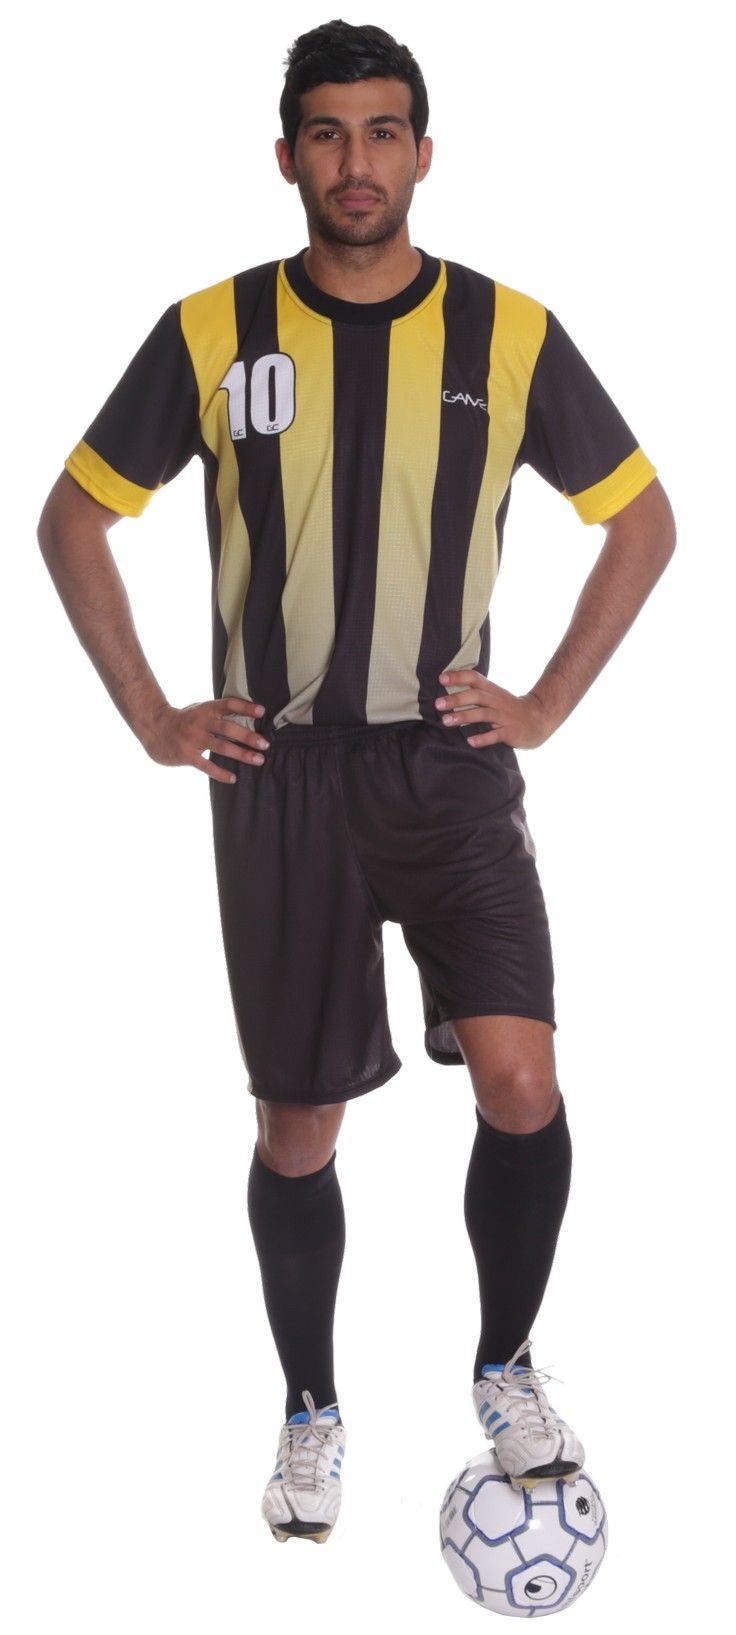 Soccer Uniforms | #Soccer #SoccerUniforms #SoccerJerseys